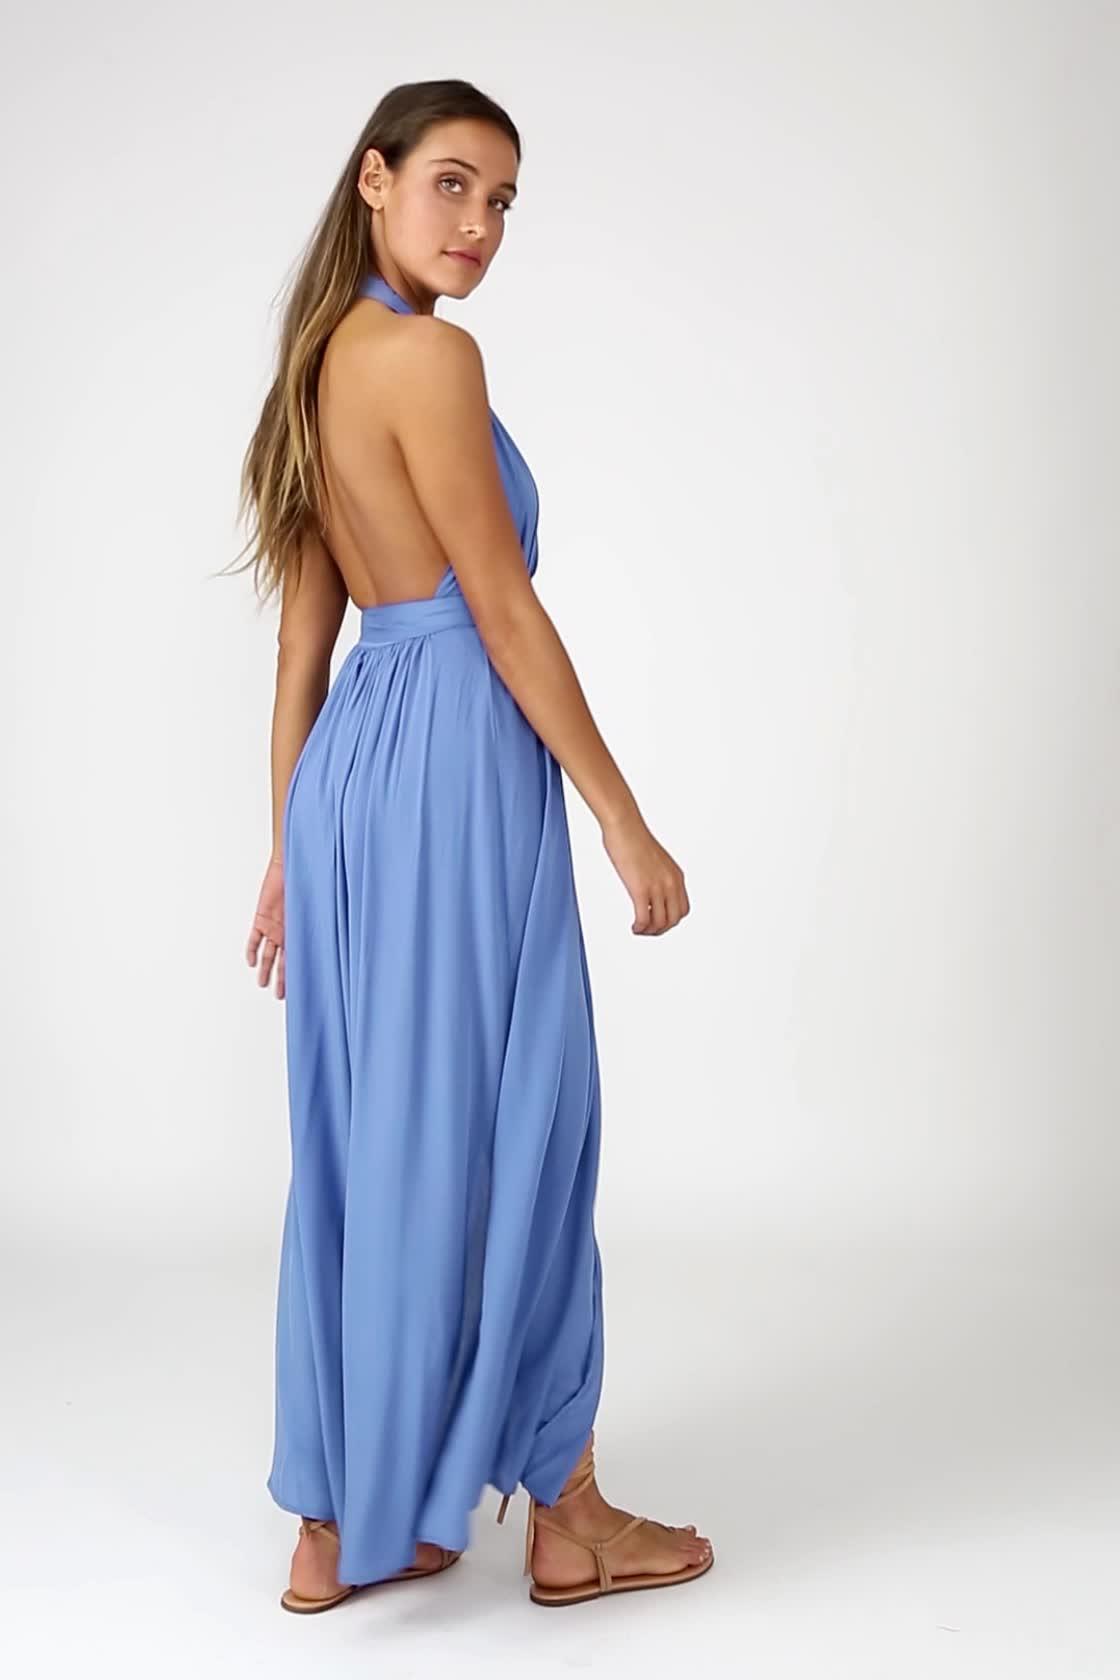 7b554d436d548 Lovely Periwinkle Blue Dress - Maxi Dress - Wrap Dress